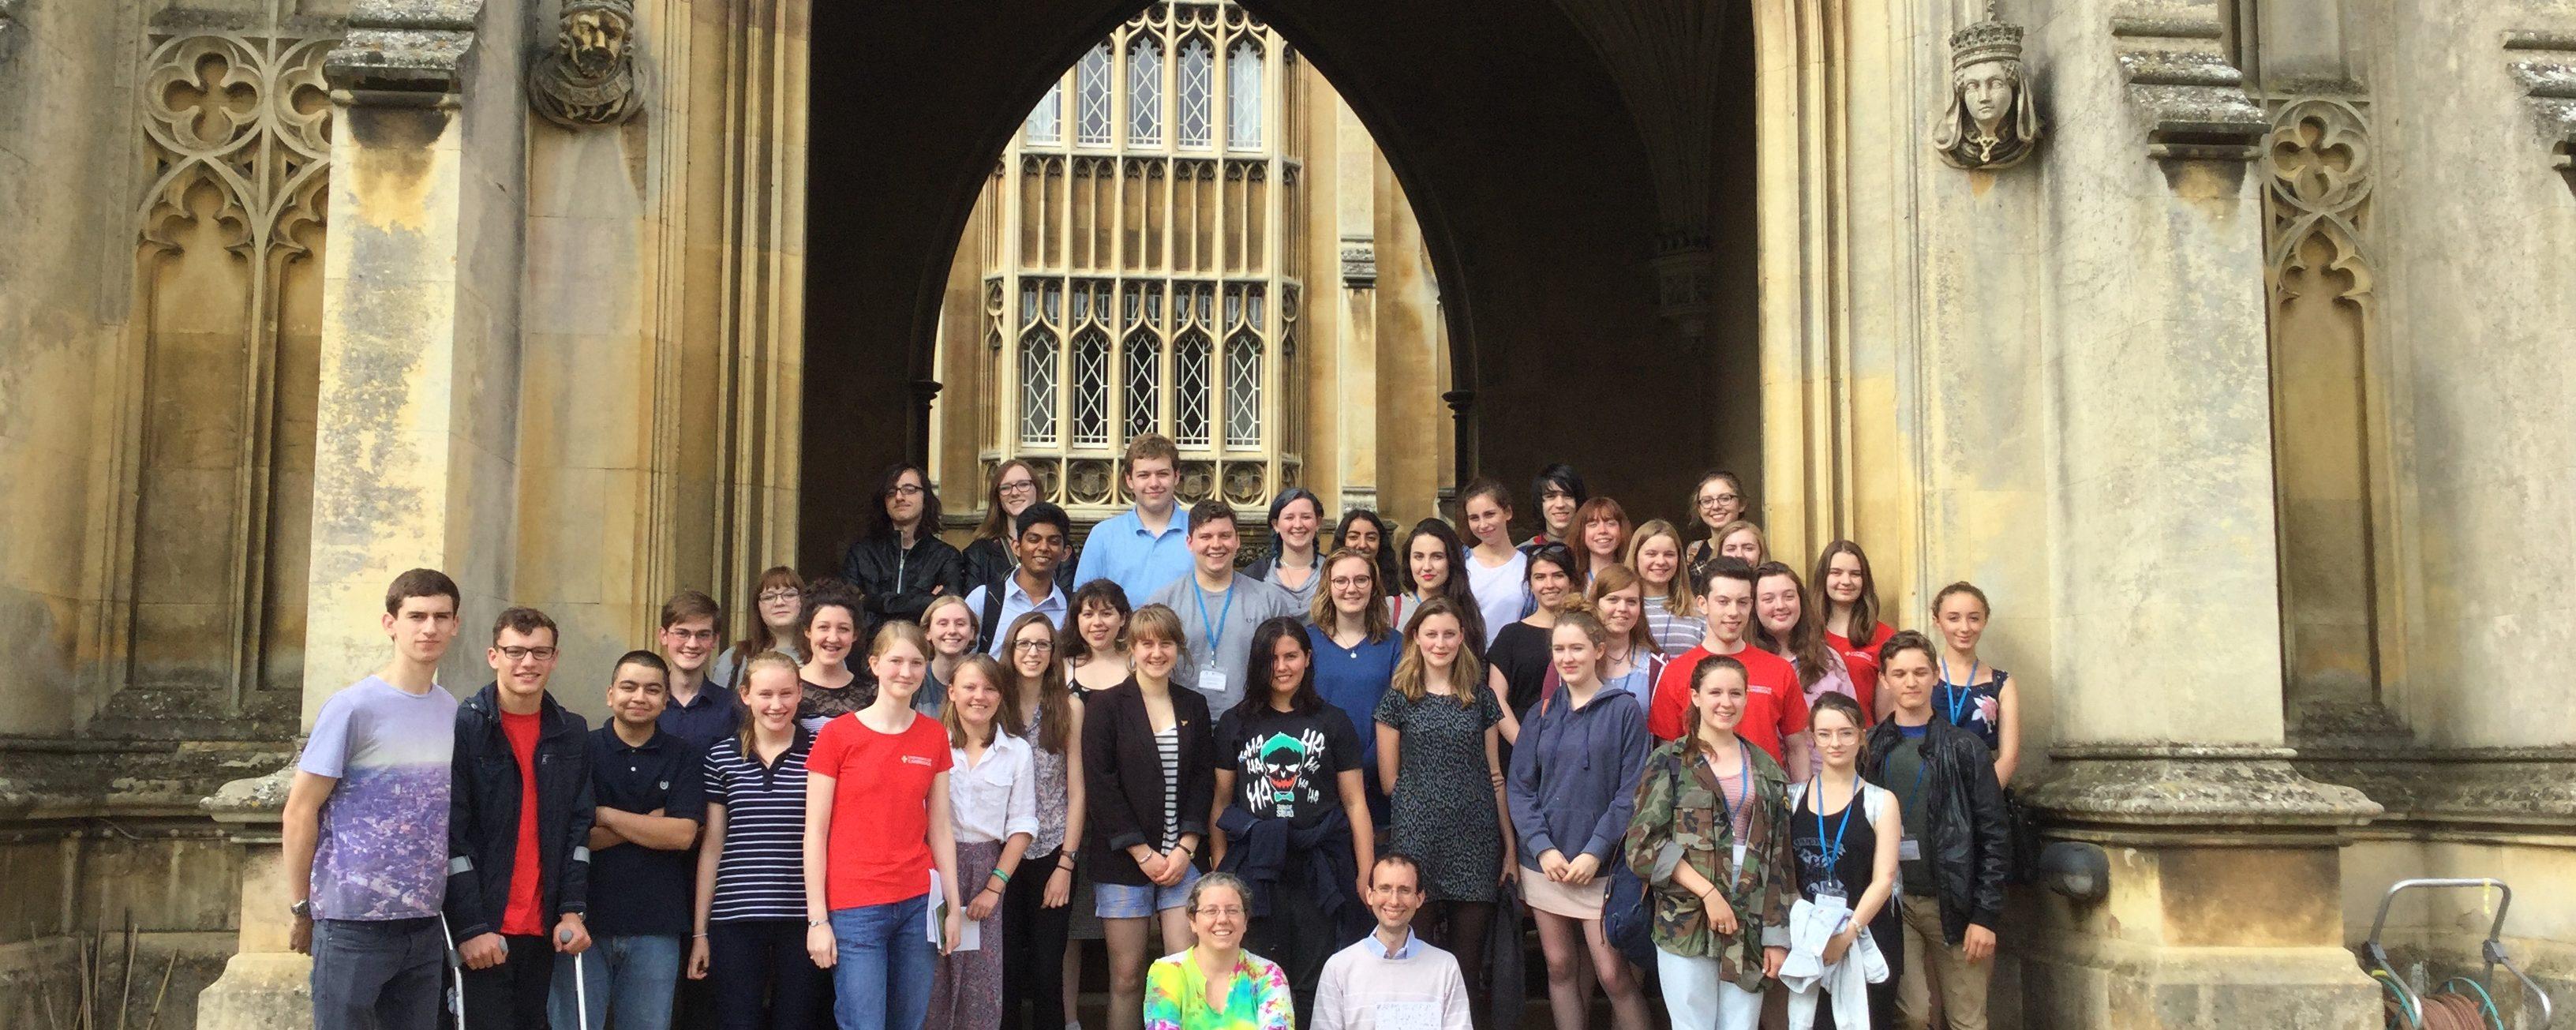 Homerton College Archaeology Summer School, 10 – 14 July, 2017